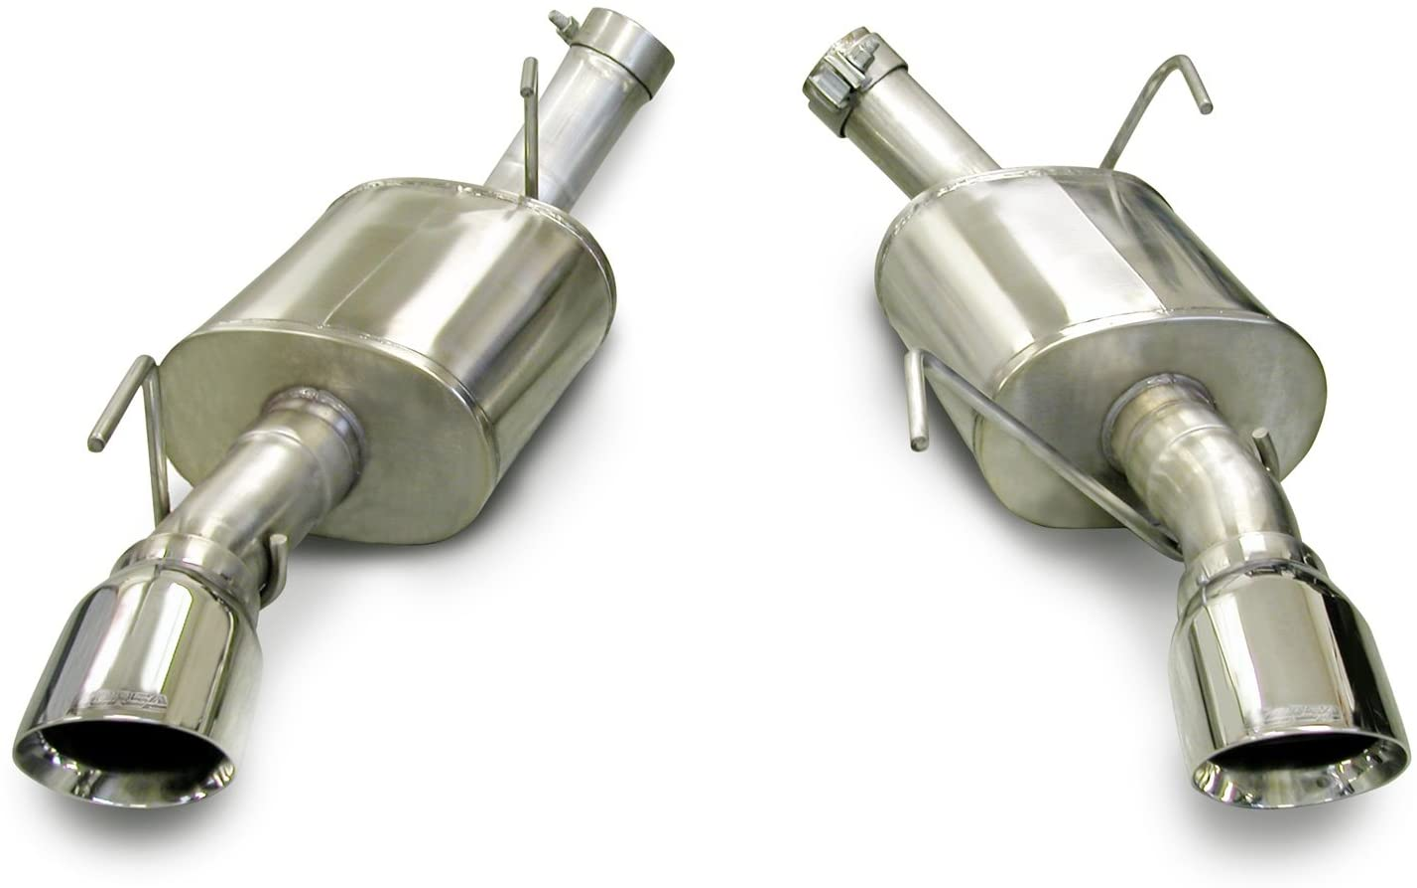 CORSA 14961 Xtreme Axle-Back System